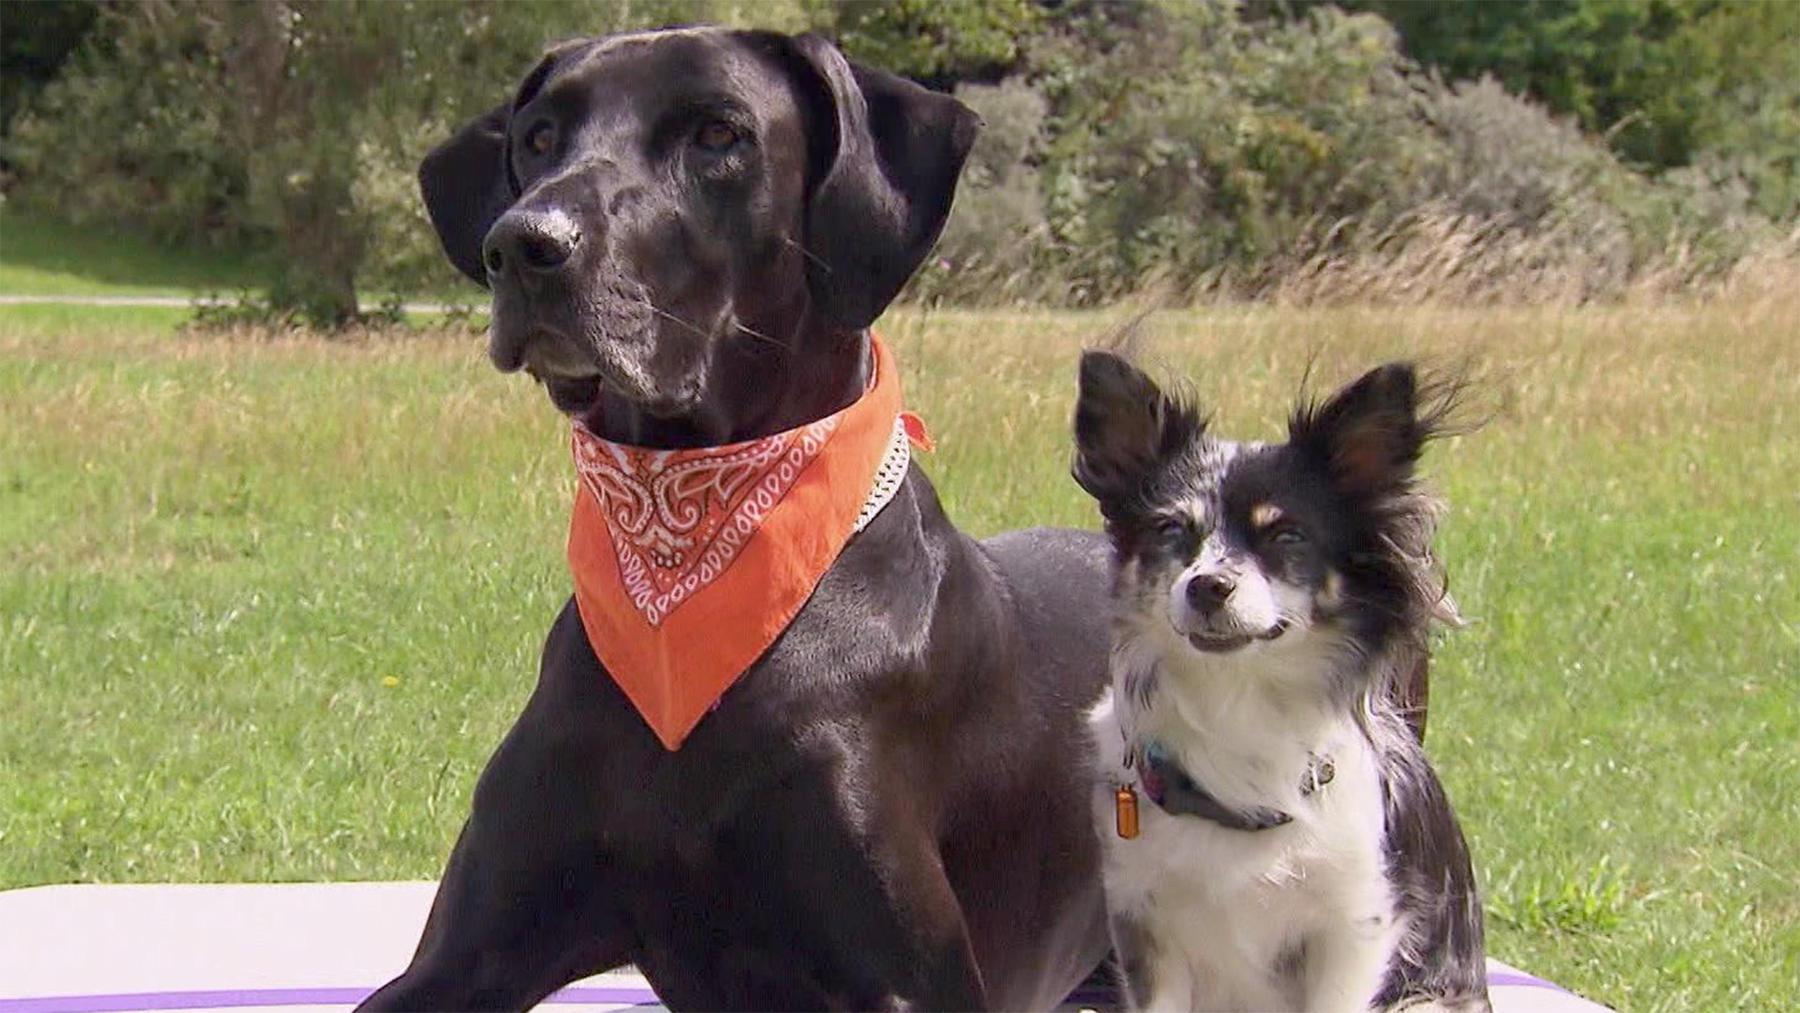 Thema u.a.: Dog Fitness - agil bis ins hohe Alter